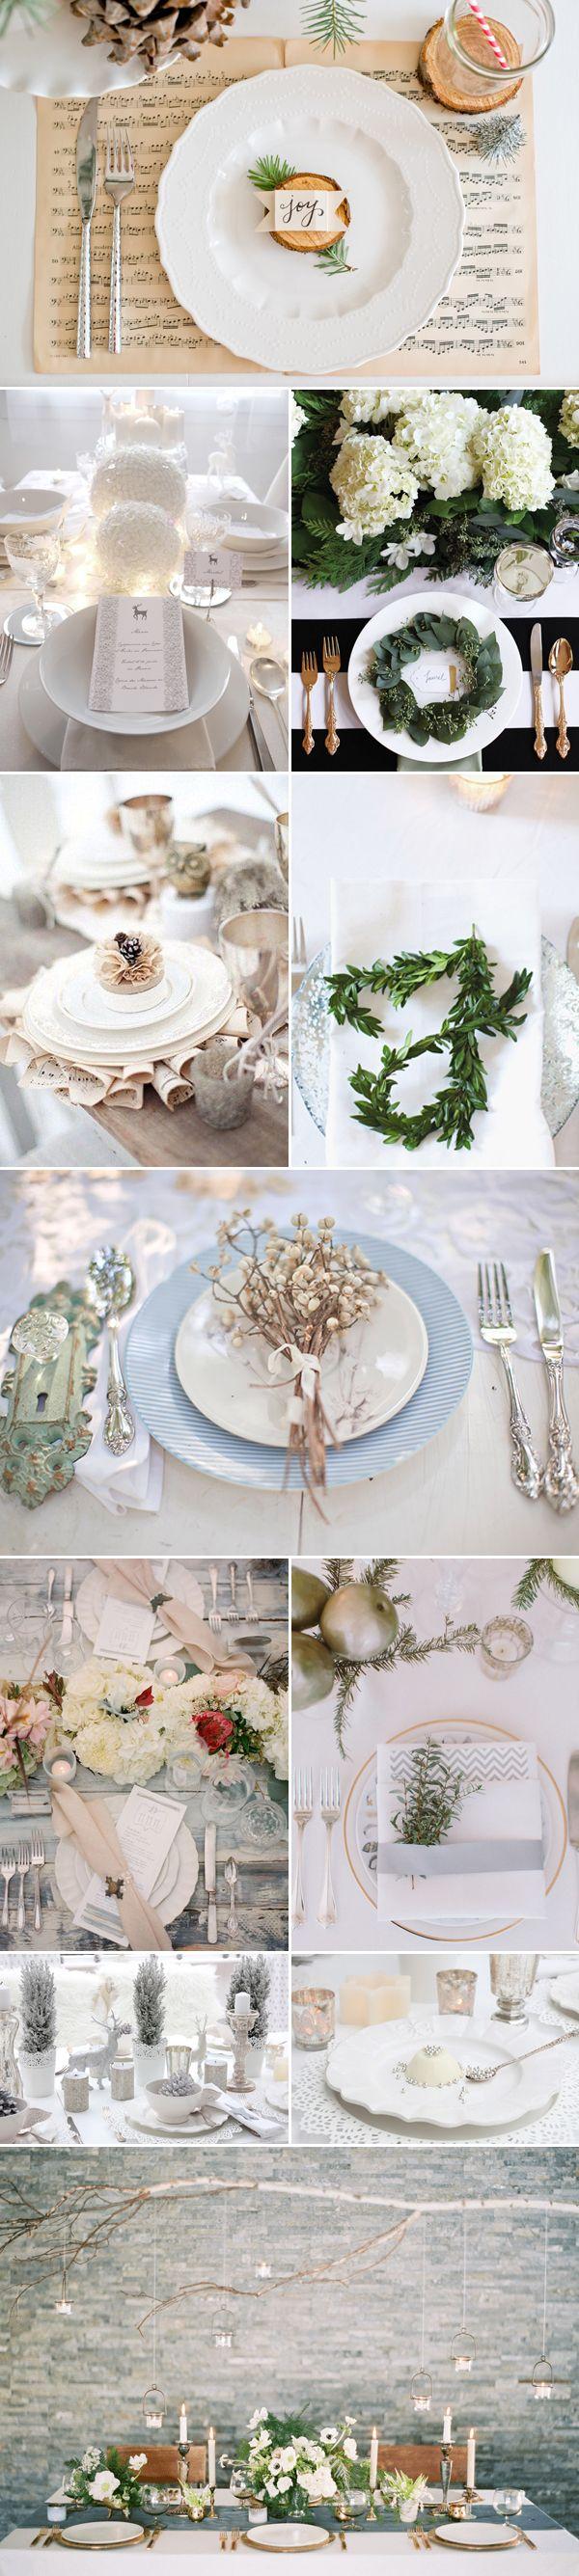 20 Winter Wedding Place Setting Ideas | Wedding place settings ...